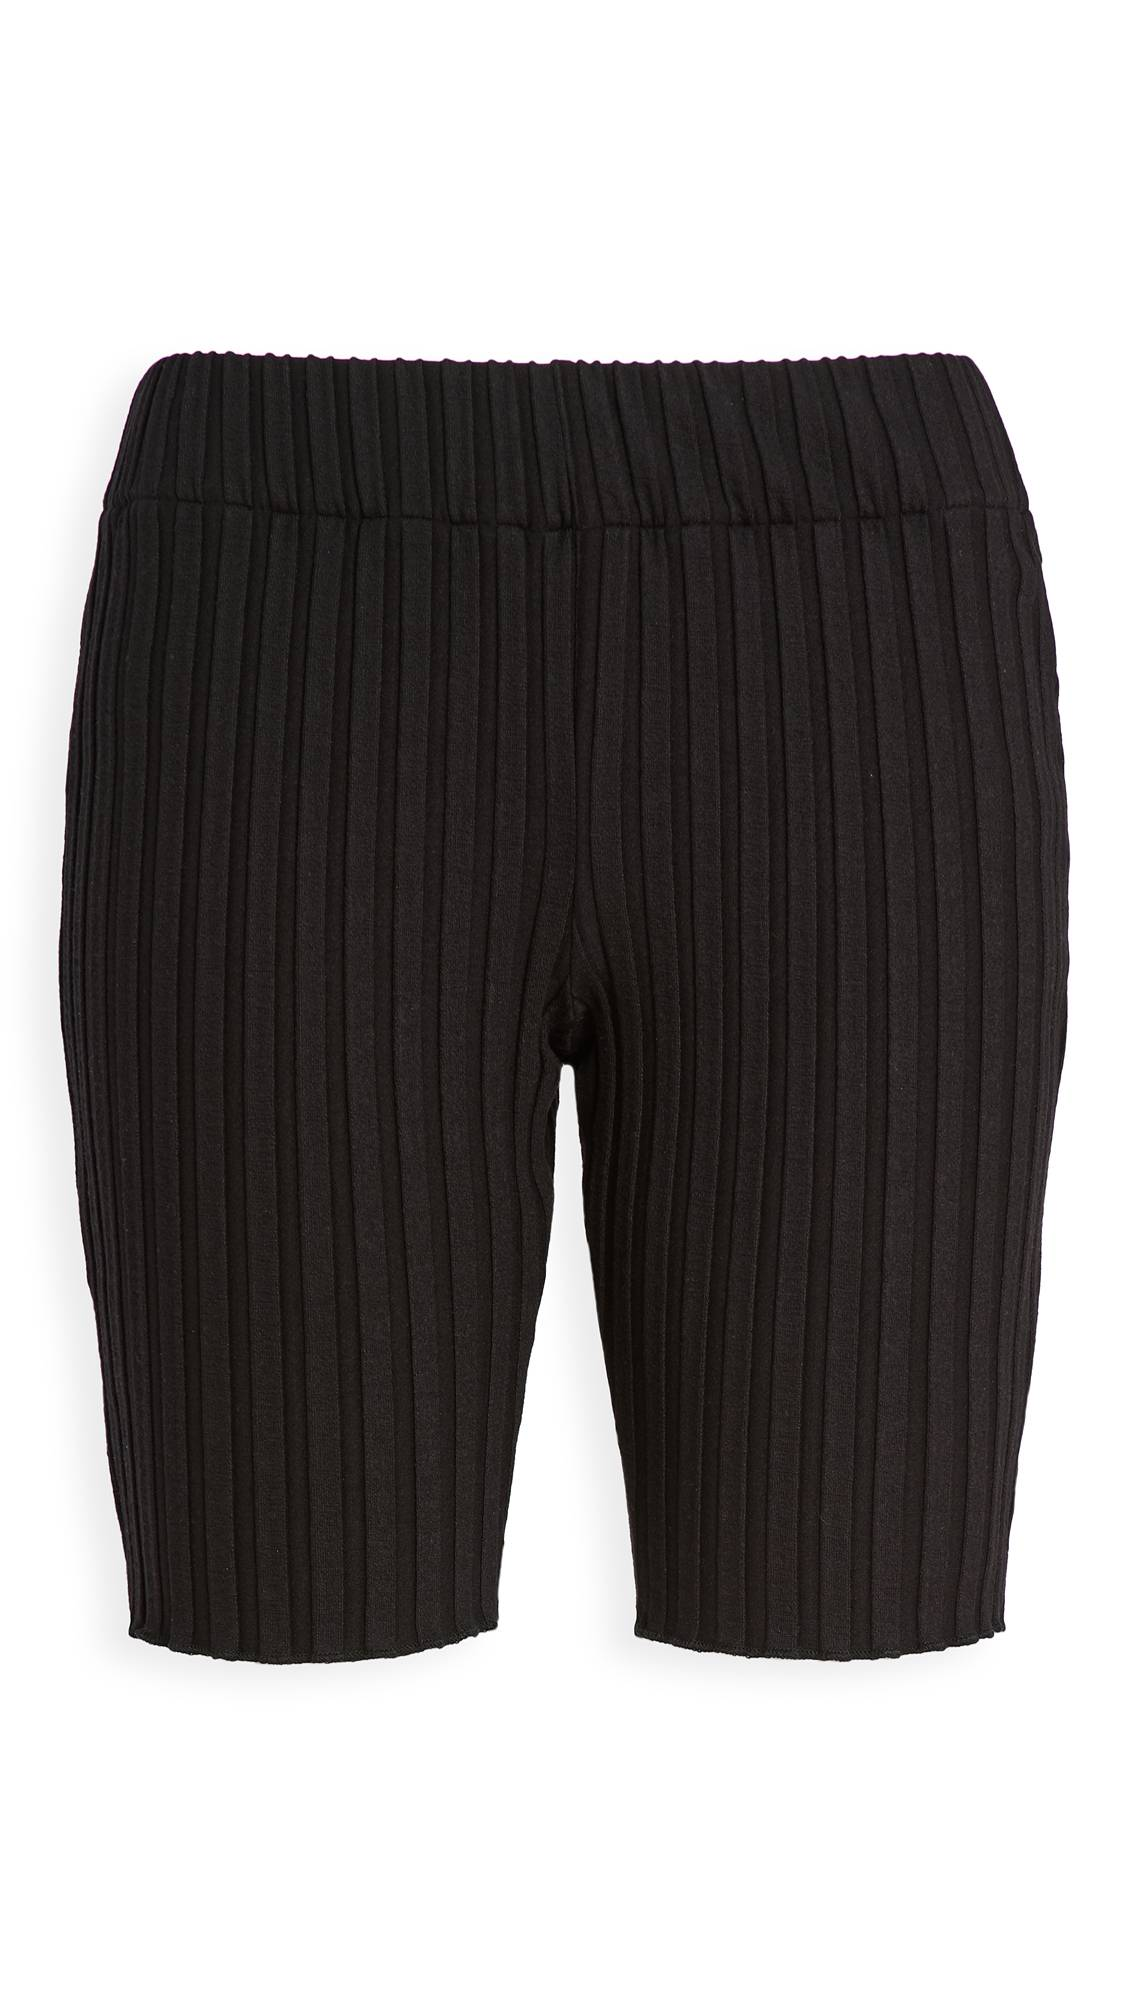 Simon Miller Burr Bike Shorts  - Black - Size: 2X-Small